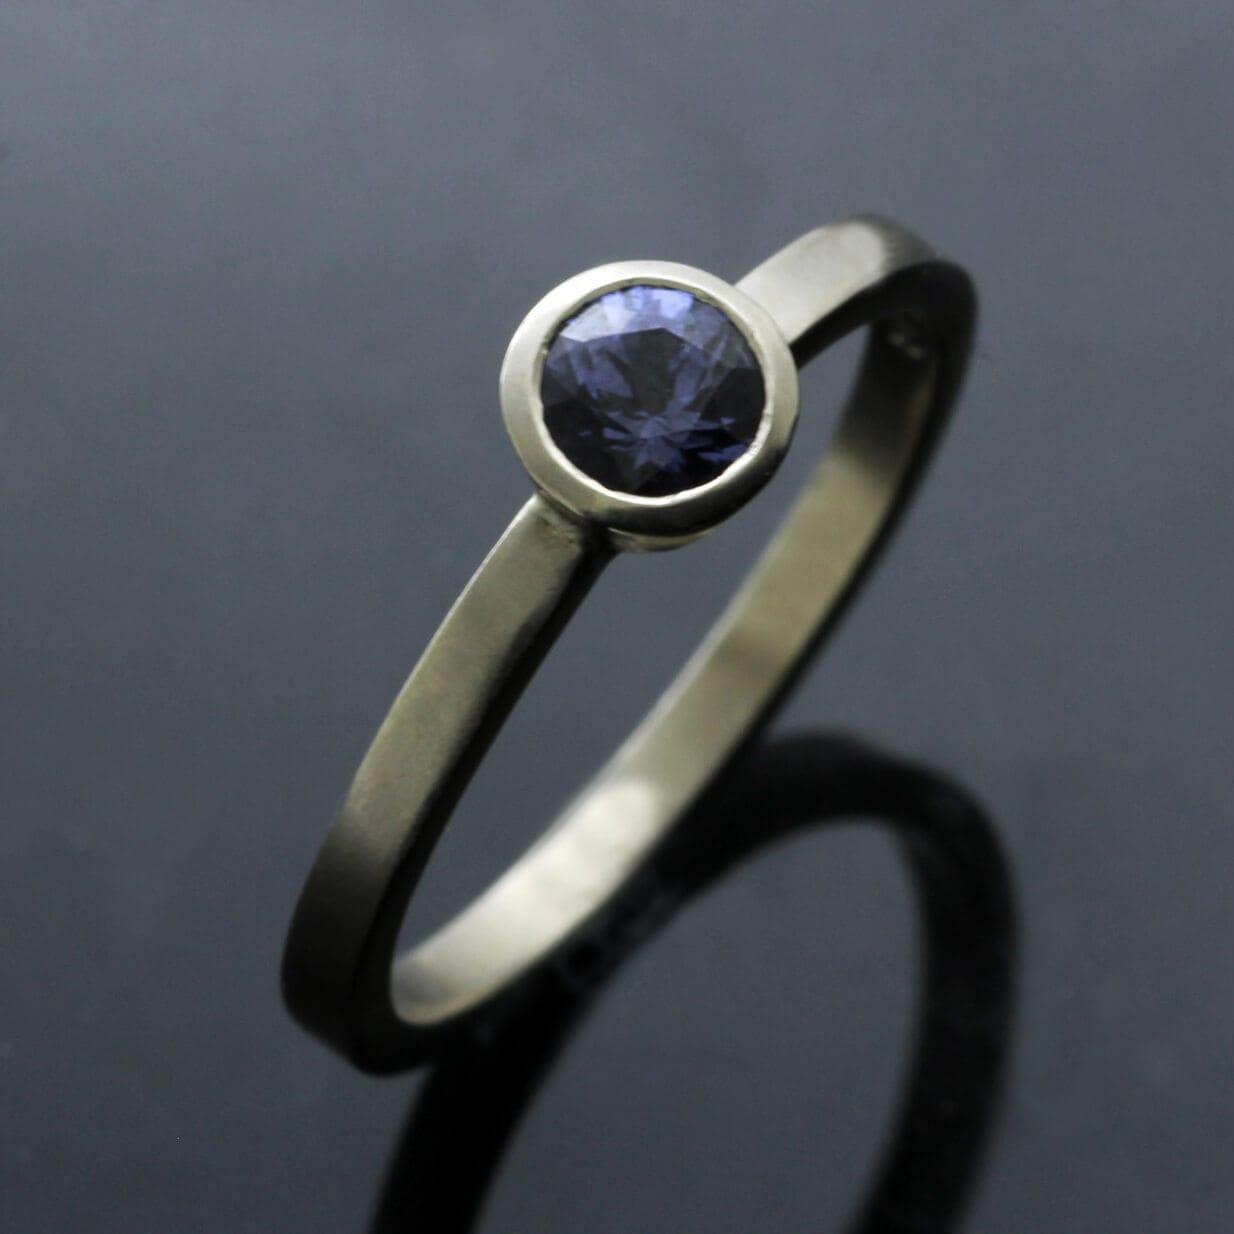 Round Brilliant Blue Sapphire gemstone 18ct White Gold modern stacking ring